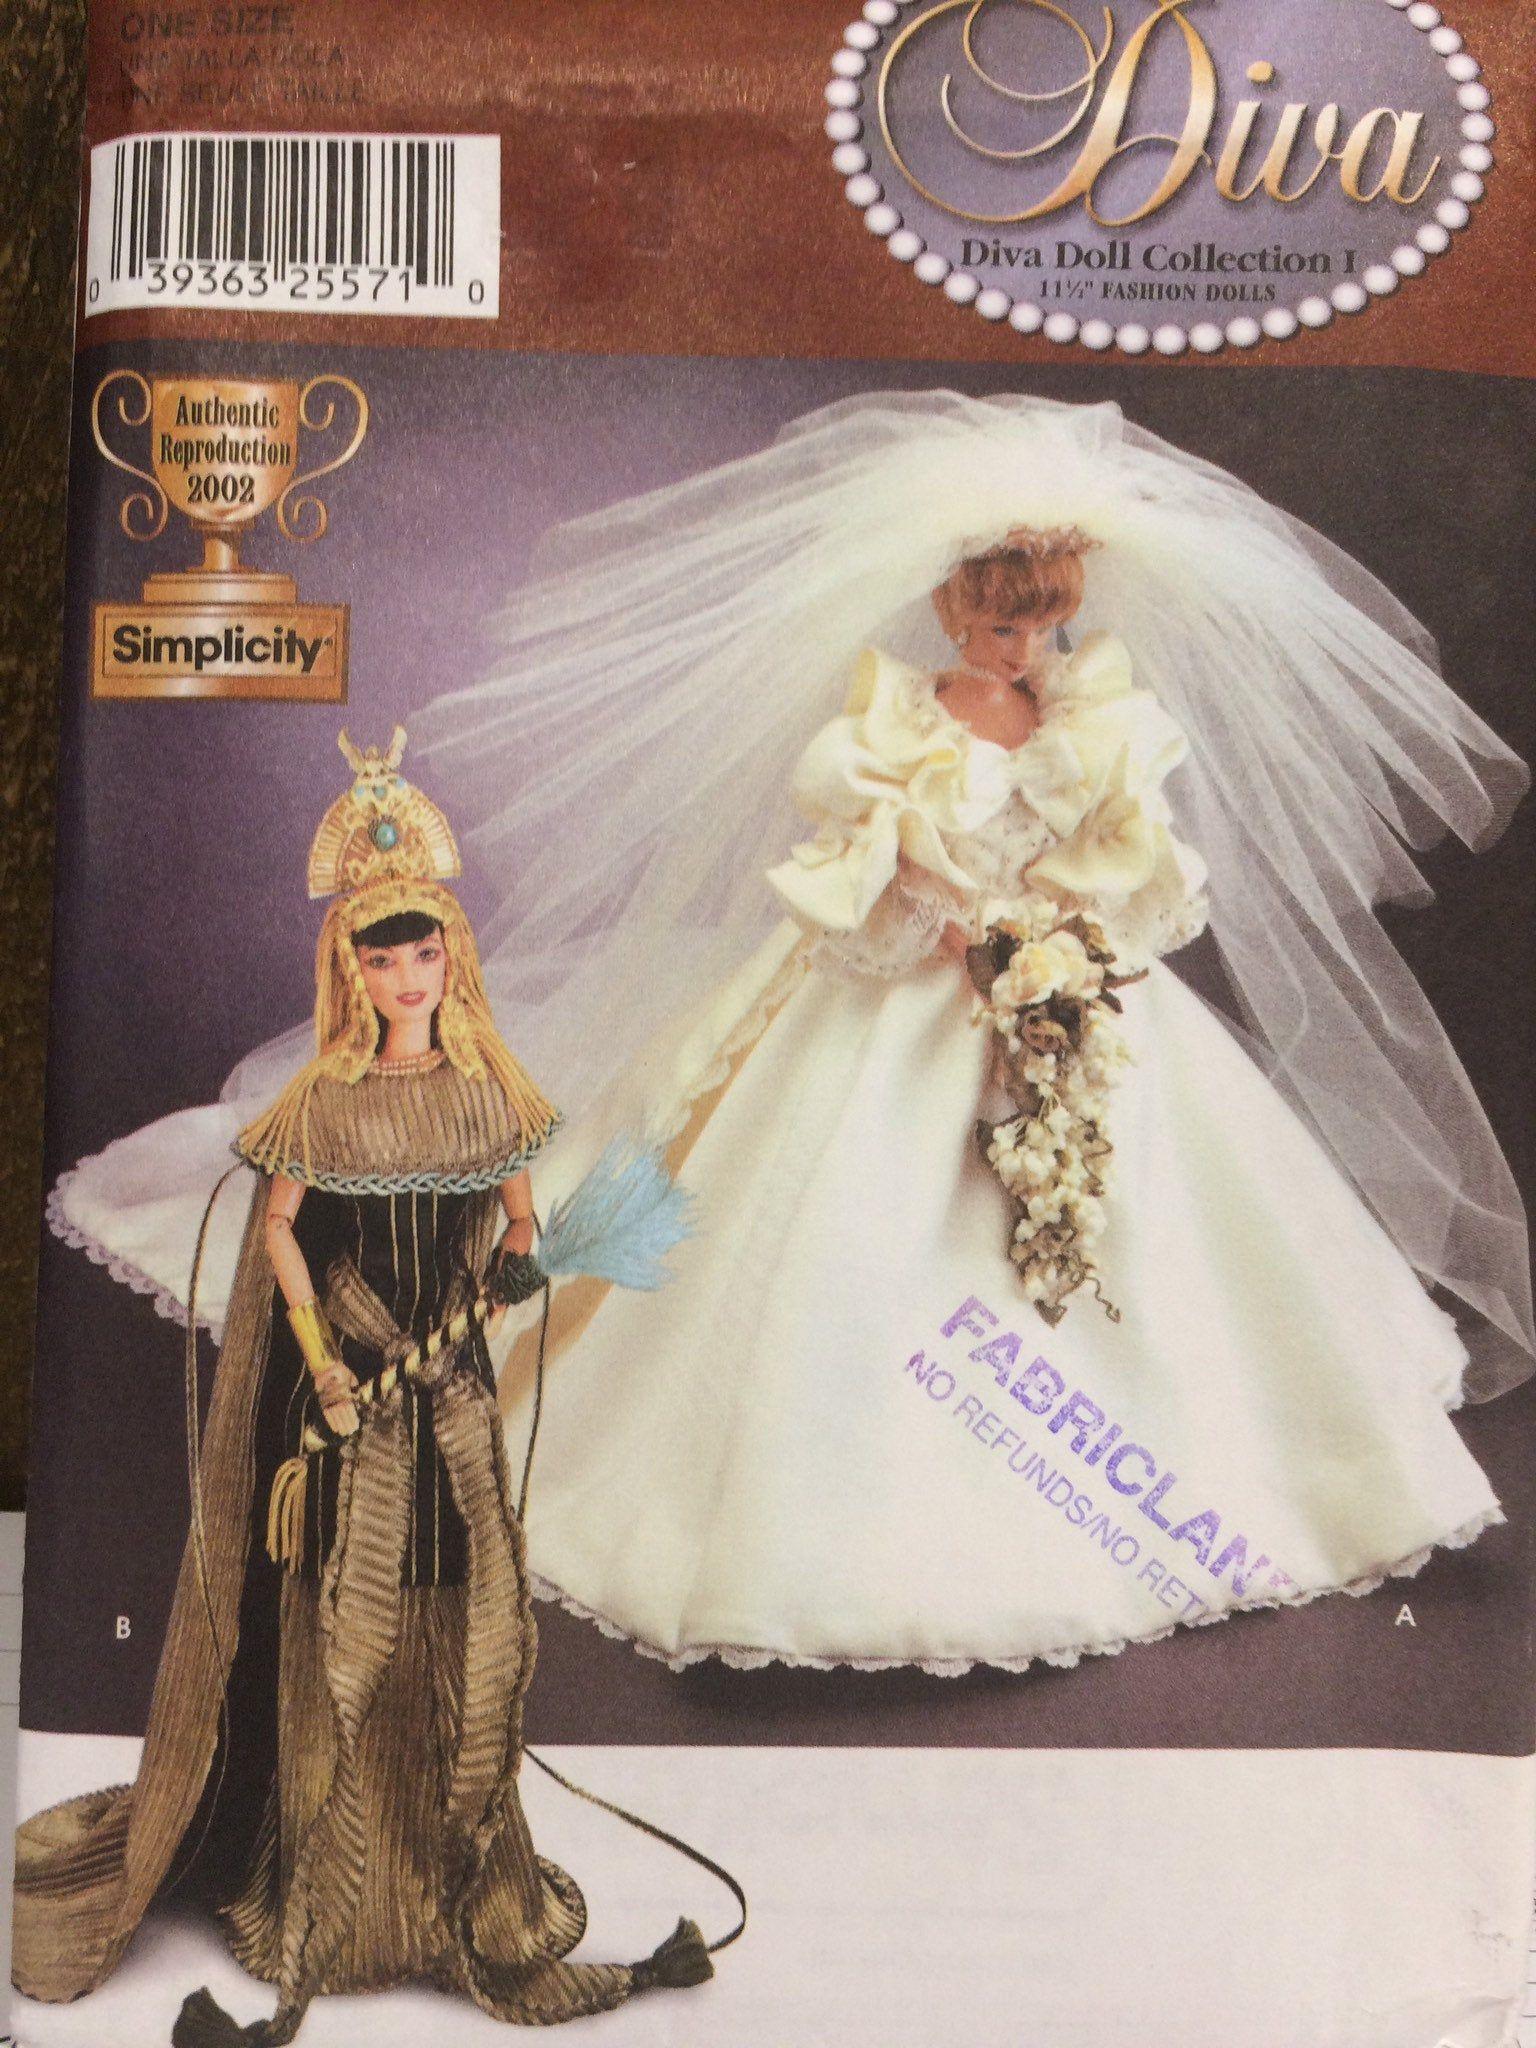 Oop Simplicity 7077 11 1 2 Fashion Doll Barbie Diva Etsy Modest Wedding Dresses Wedding Dresses With Straps Diana Wedding Dress [ jpg ]